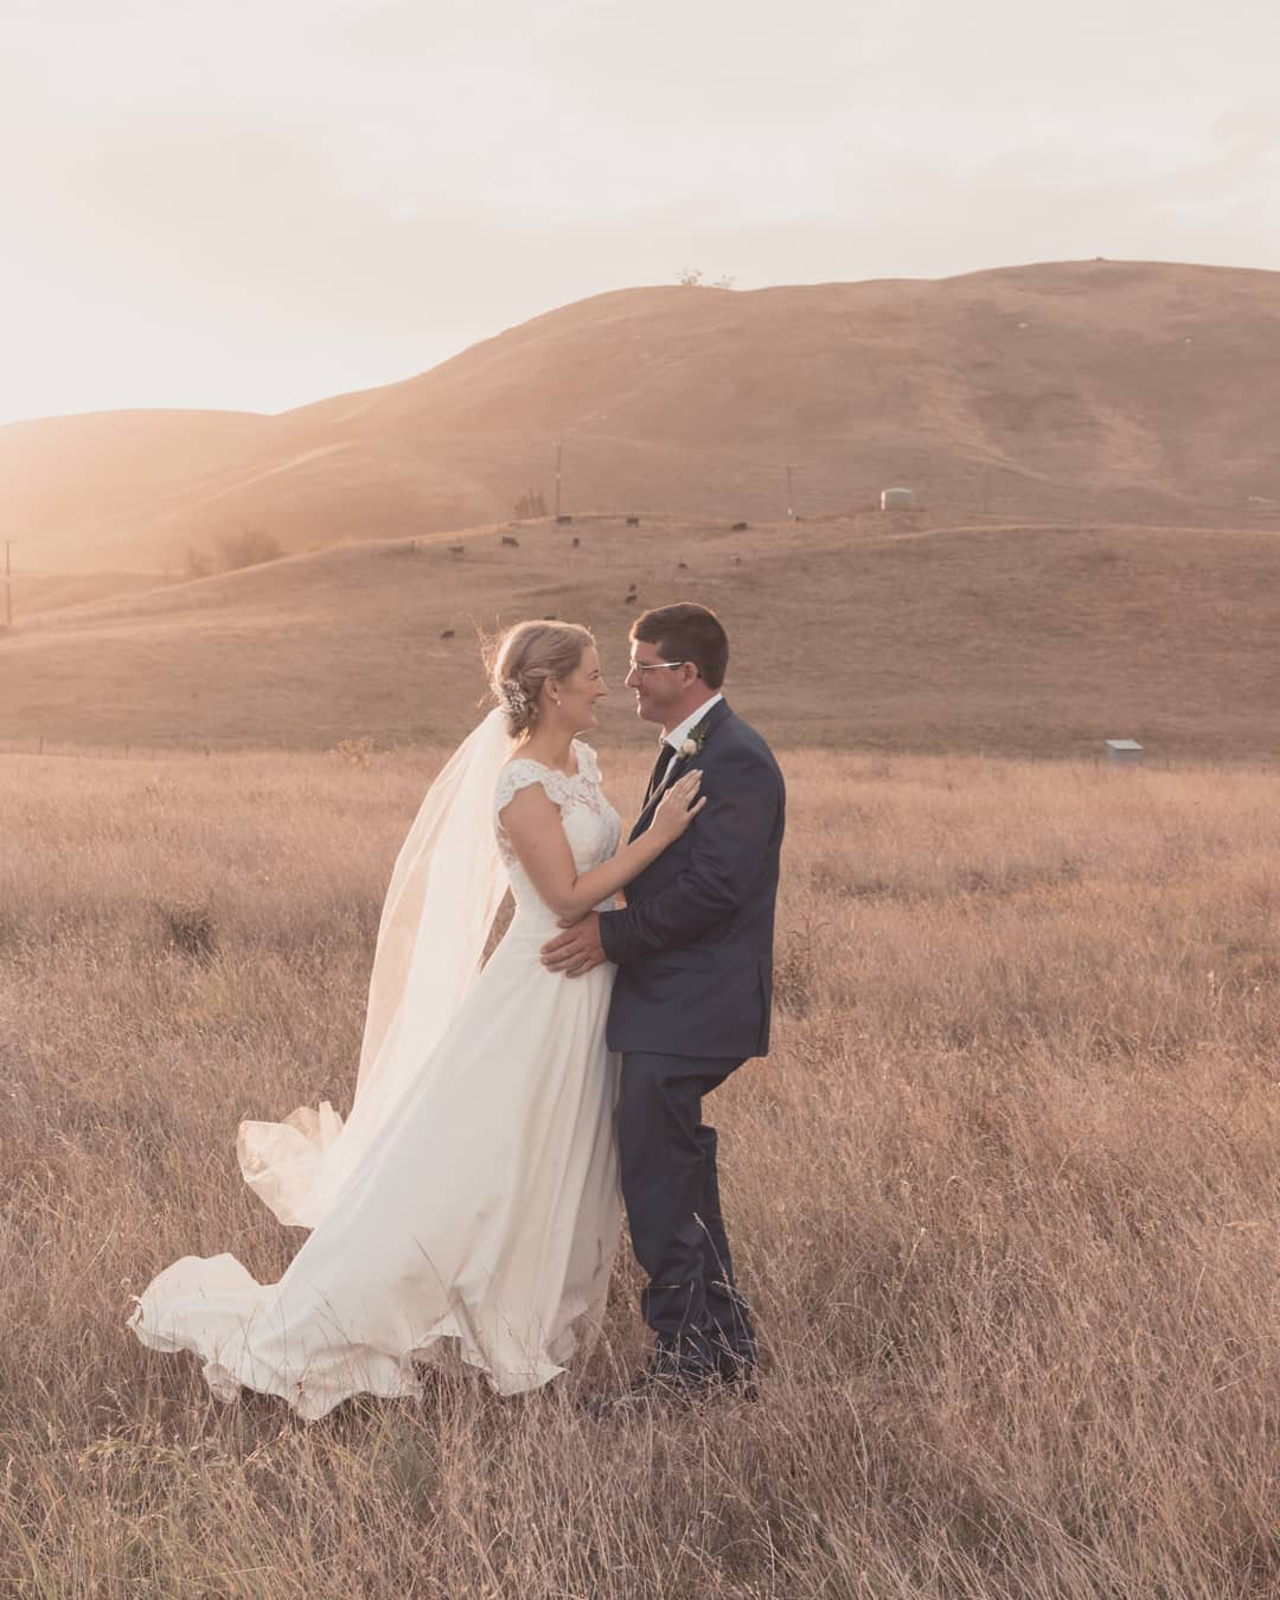 wedding-photography-photos-for-jean17.JPG